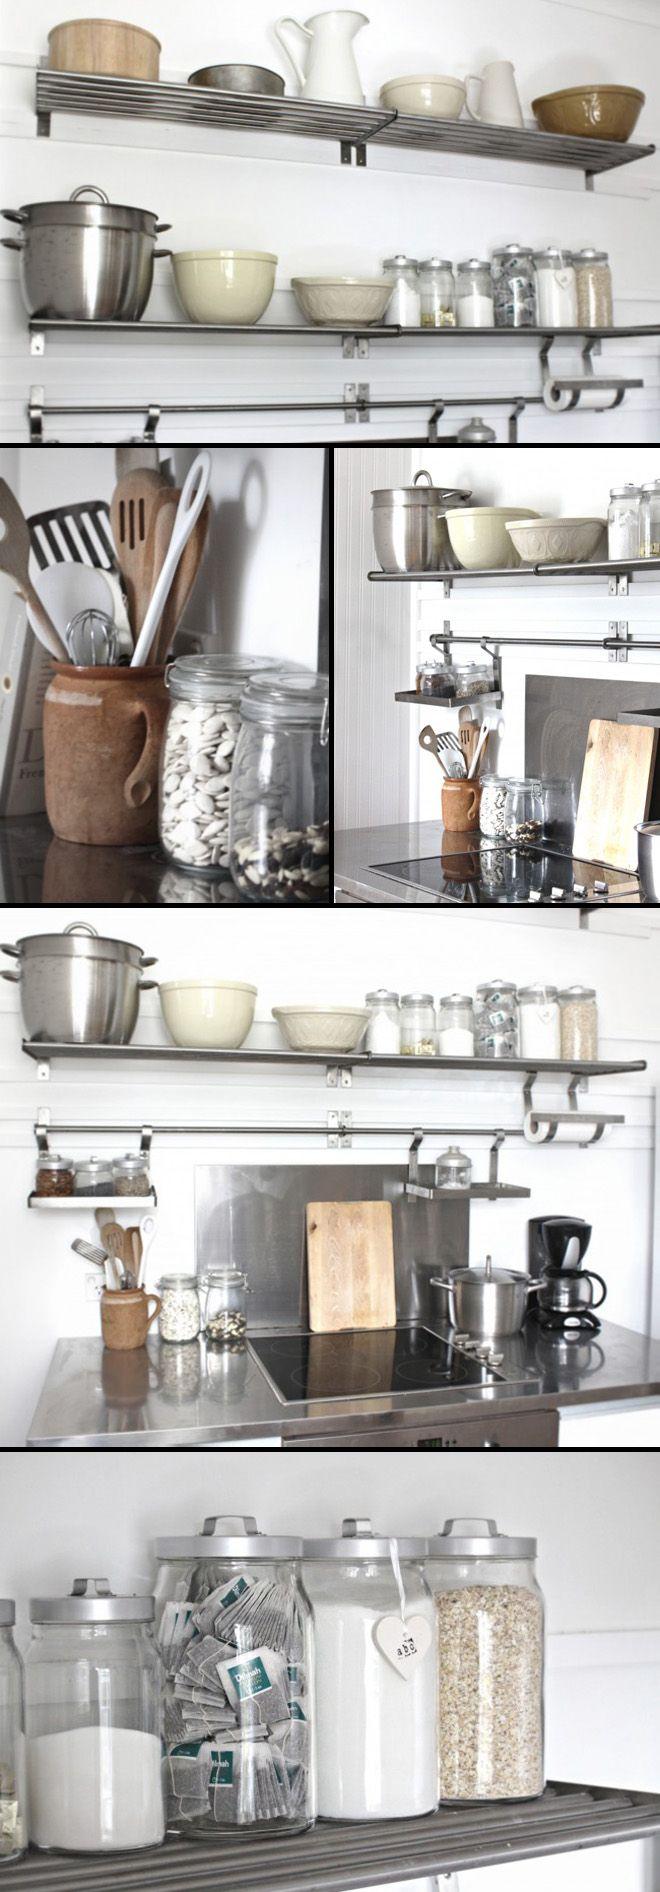 Ikea kitchen shelves stainless steel - Beach Cottage Kitchen Organization Part I